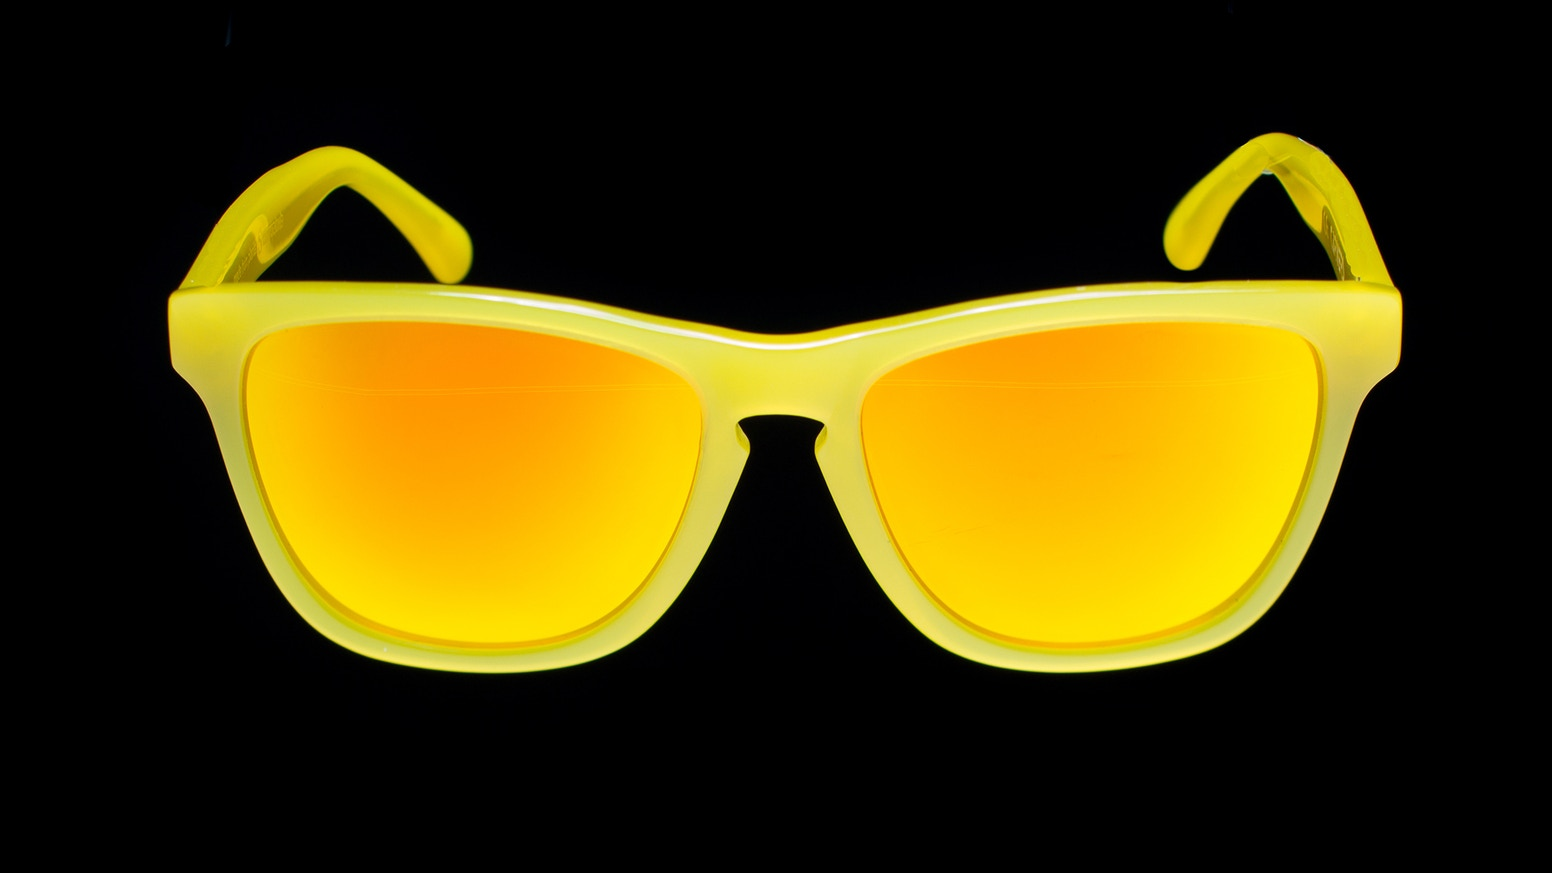 e121256ac4e Carvers Sunglasses by Epicstoke  Rediscover the Sun by Joe   Nick ...